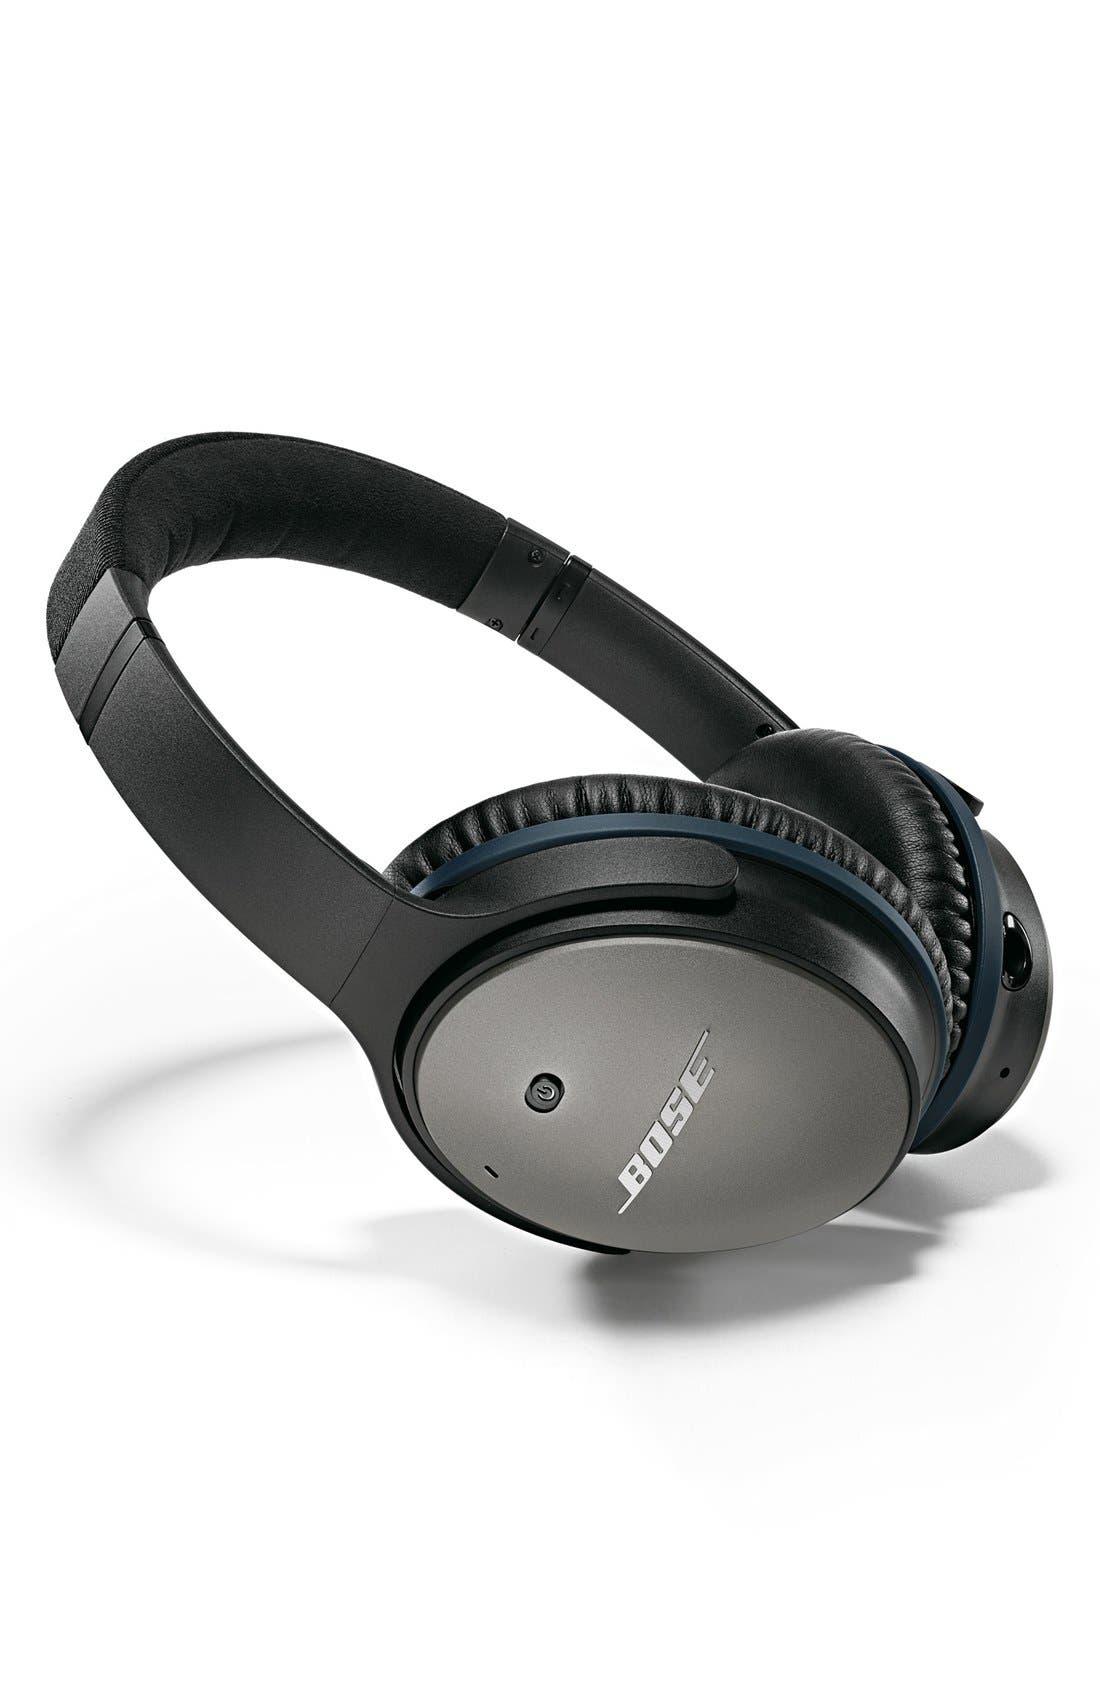 Alternate Image 2  - Bose® QuietComfort® 25 Acoustic Noise Cancelling® iOS Headphones